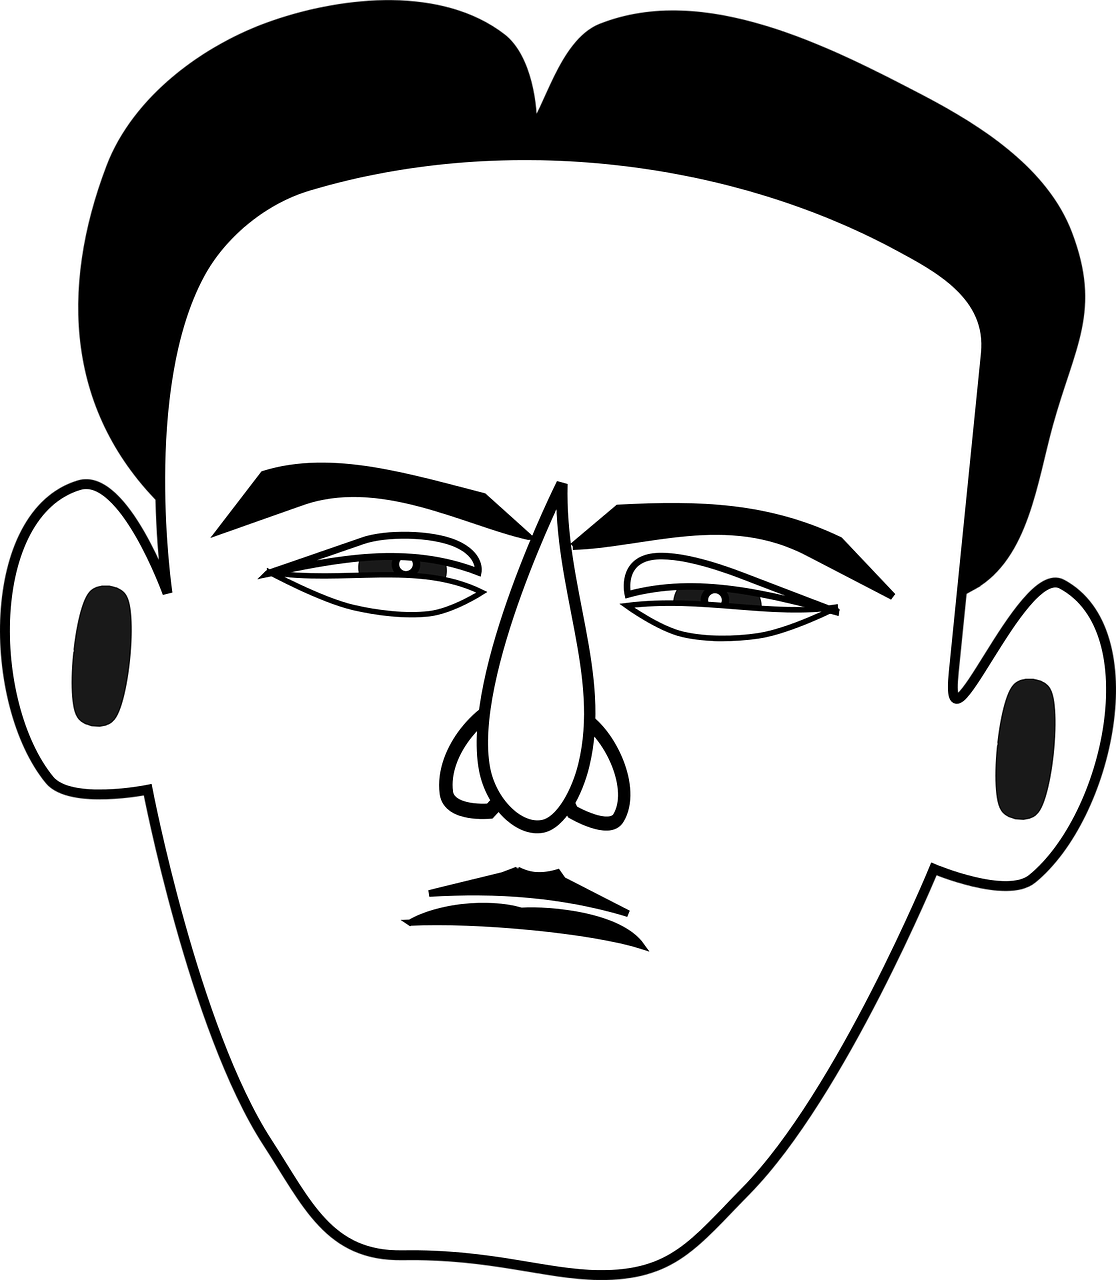 https://pixabay.com/en/afraid-emotion-face-fear-timid-1294187/